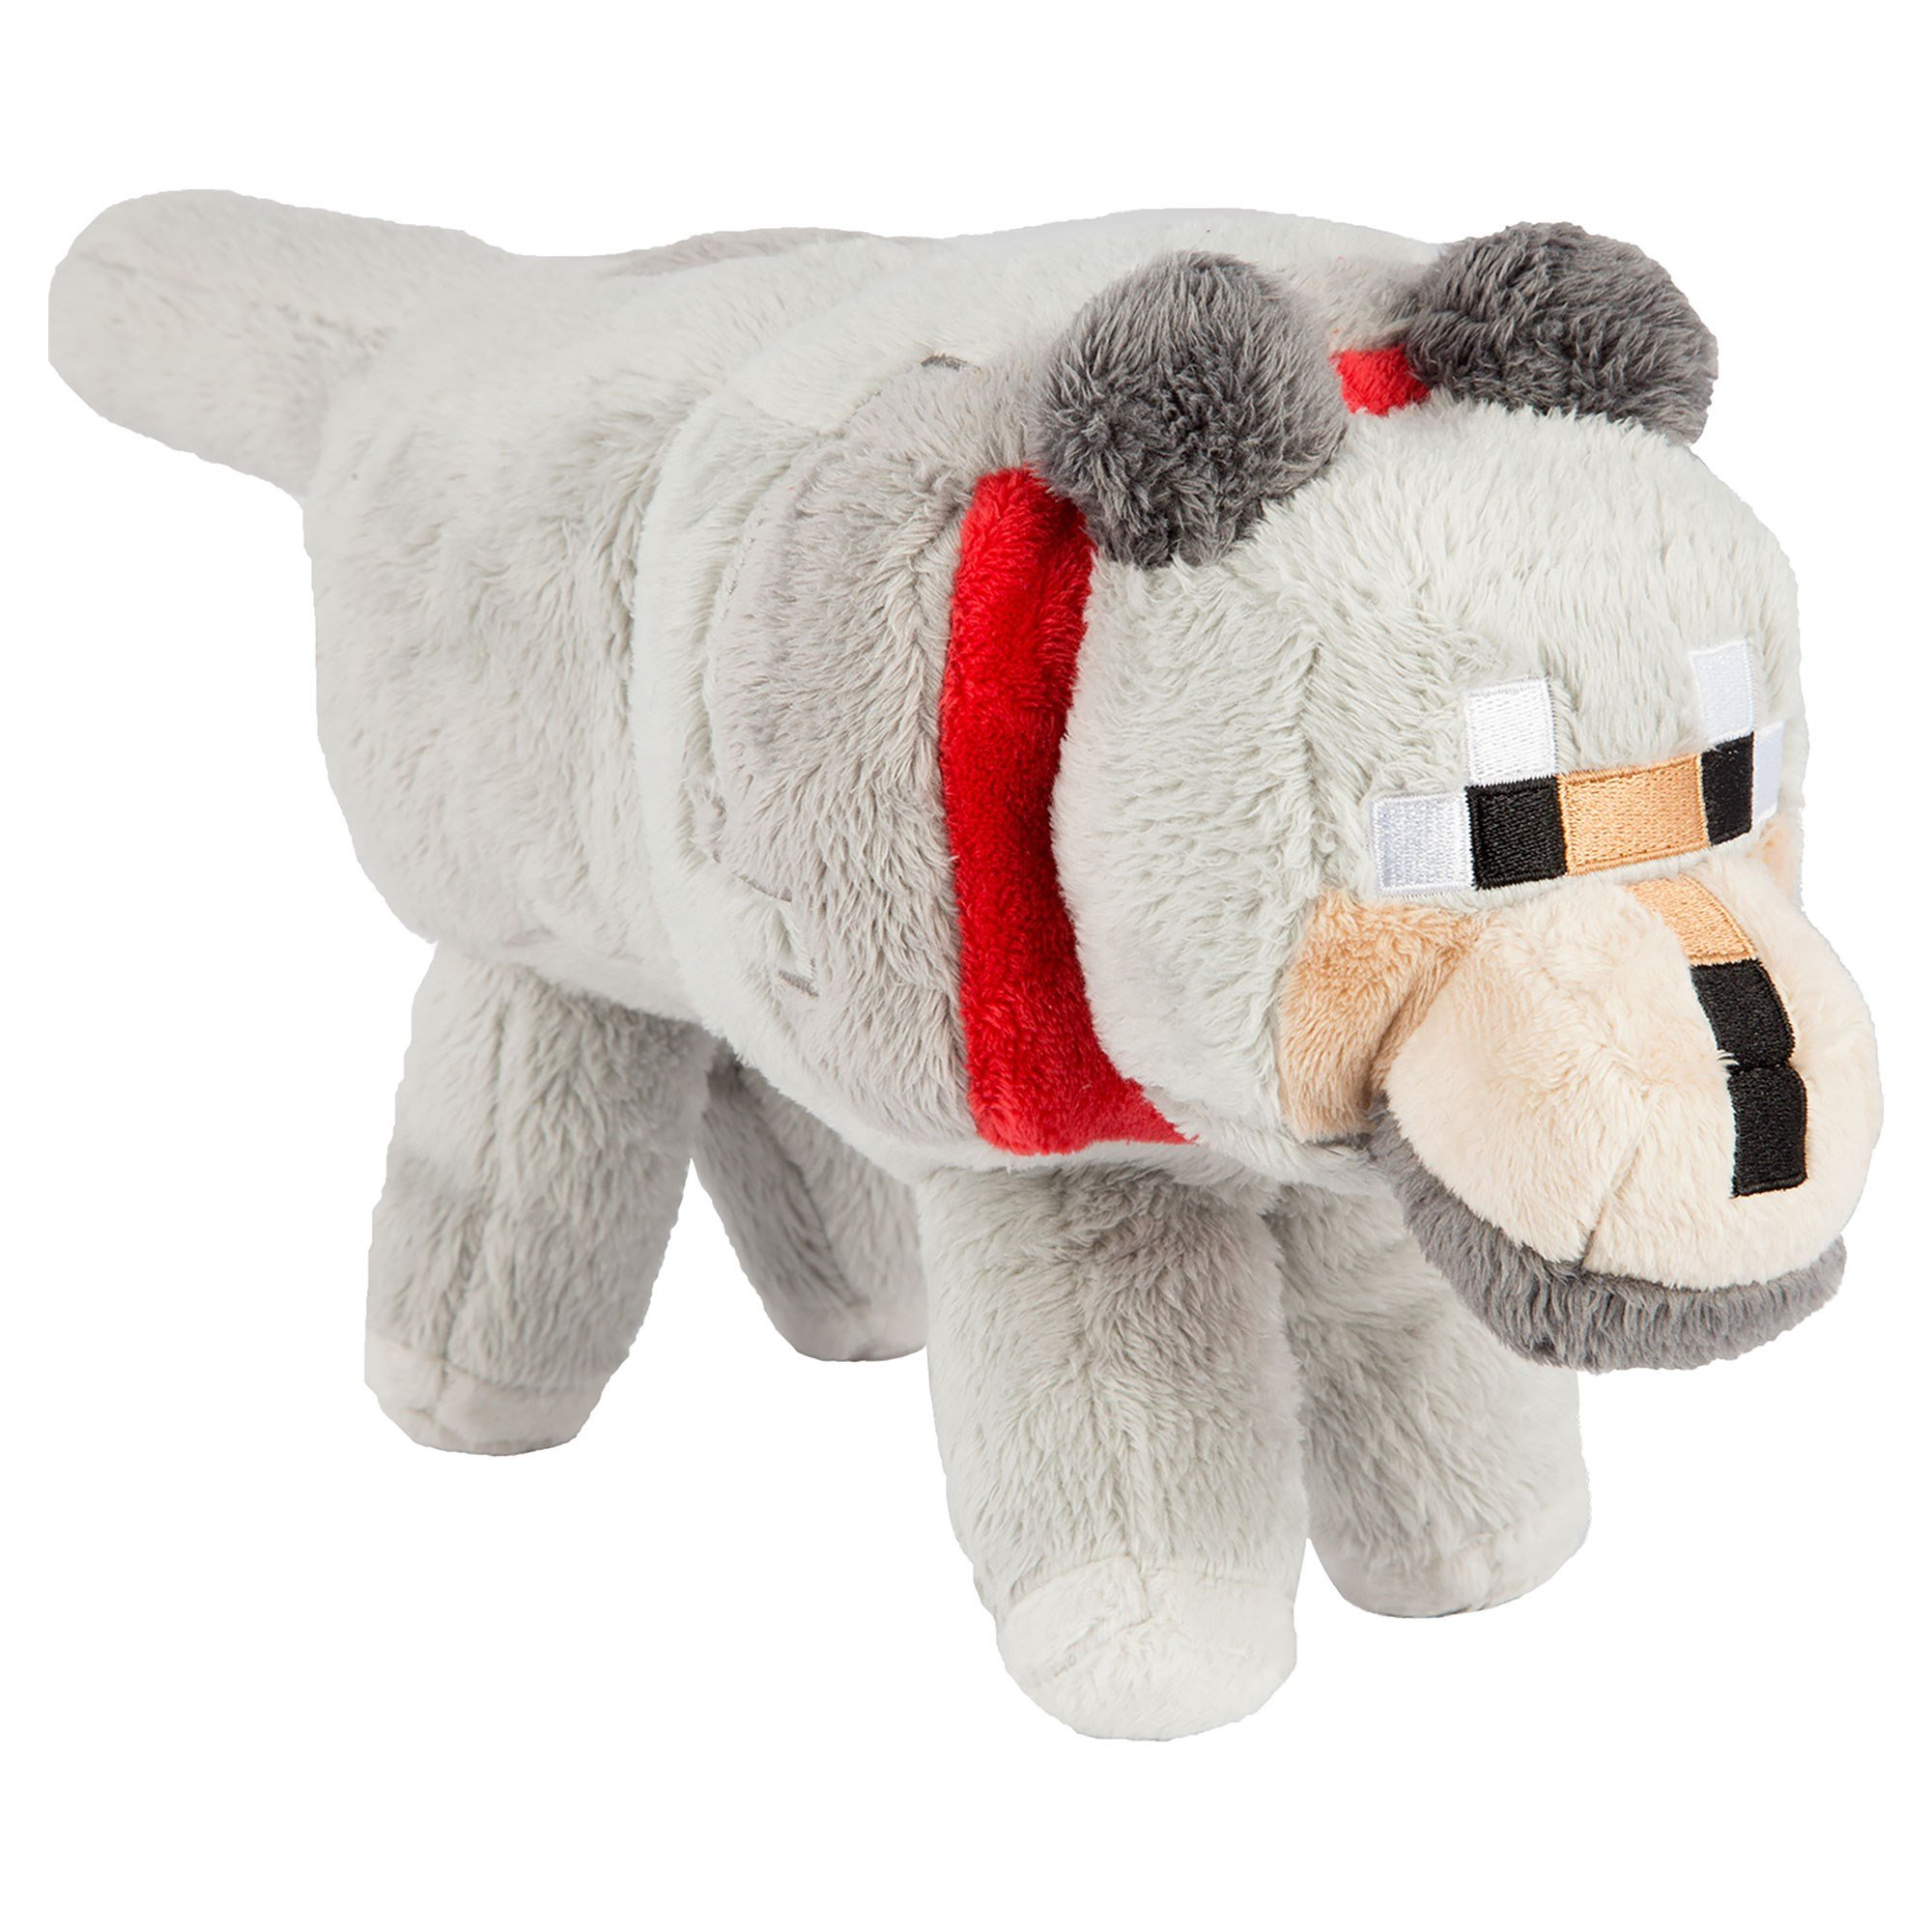 JINX Minecraft Wolf Plush Stuffed Toy (Grey, 15'' Long)